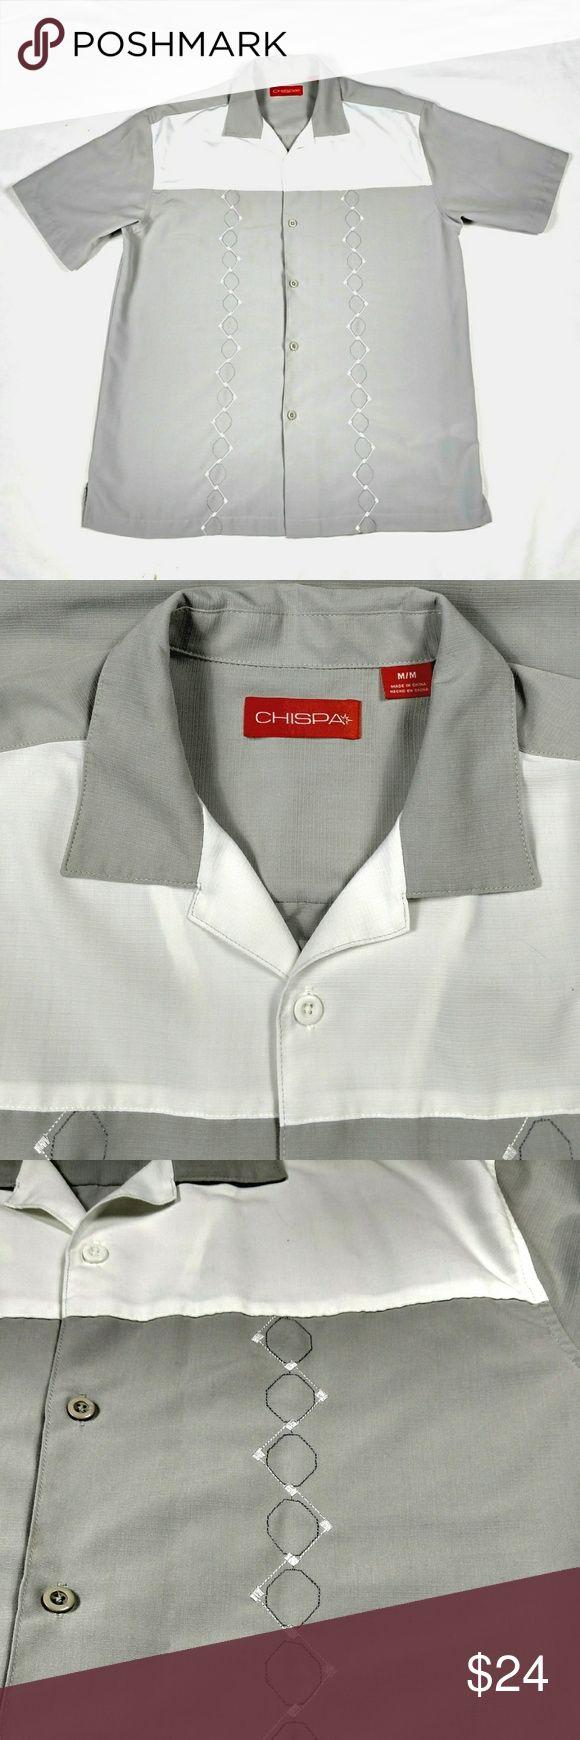 CHISPA Guayabera Men's Cuban Button down Medium CHISPA Guayabera Men's Cuban Beach Wedding Button-up Casual Dress Shirt MEDIUM (E) CHISPA Shirts Casual Button Down Shirts